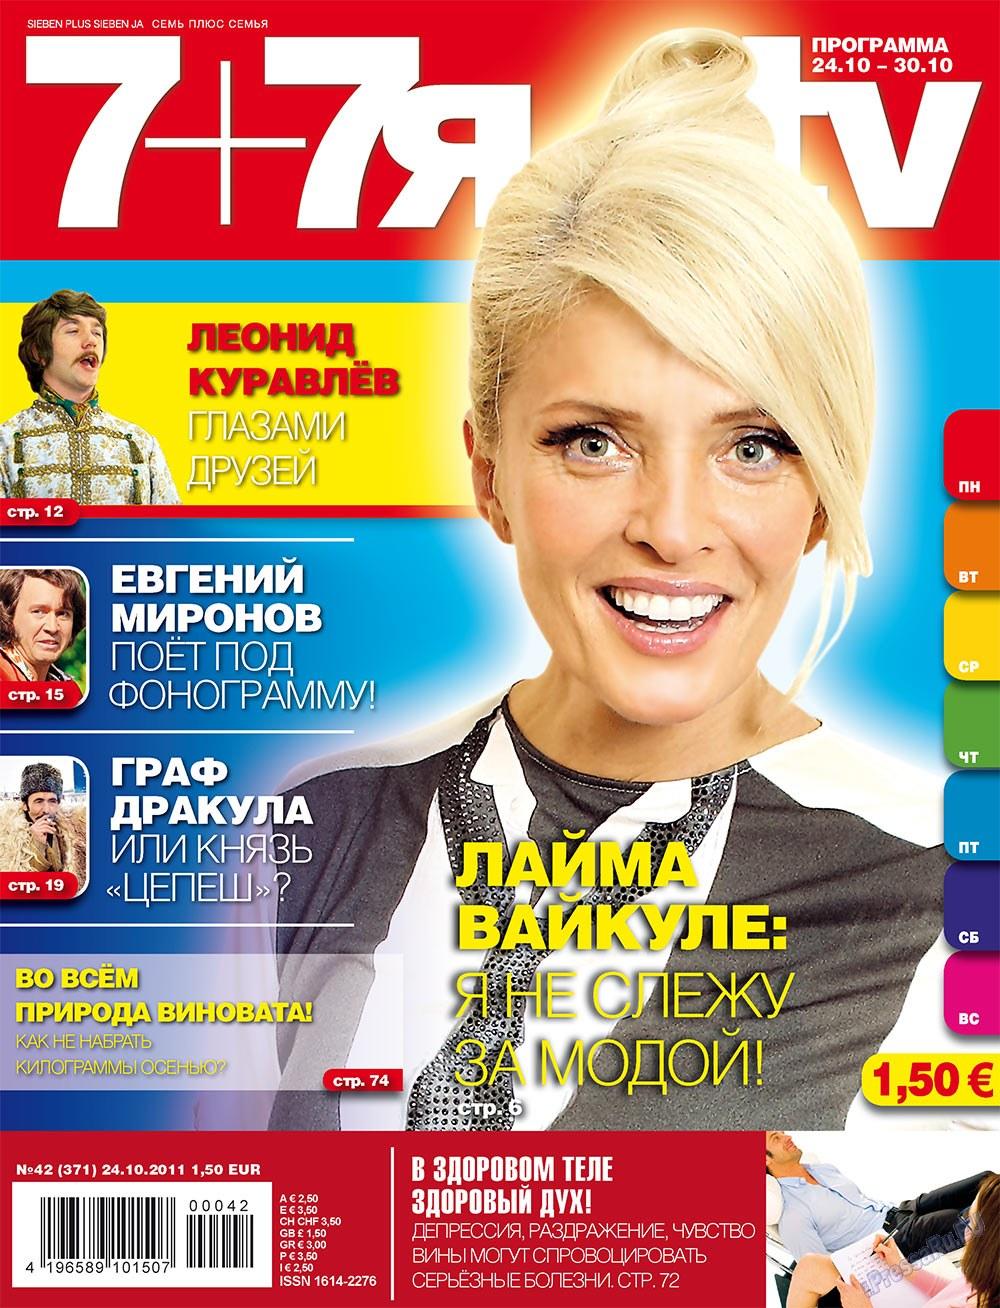 7плюс7я (журнал). 2011 год, номер 42, стр. 1